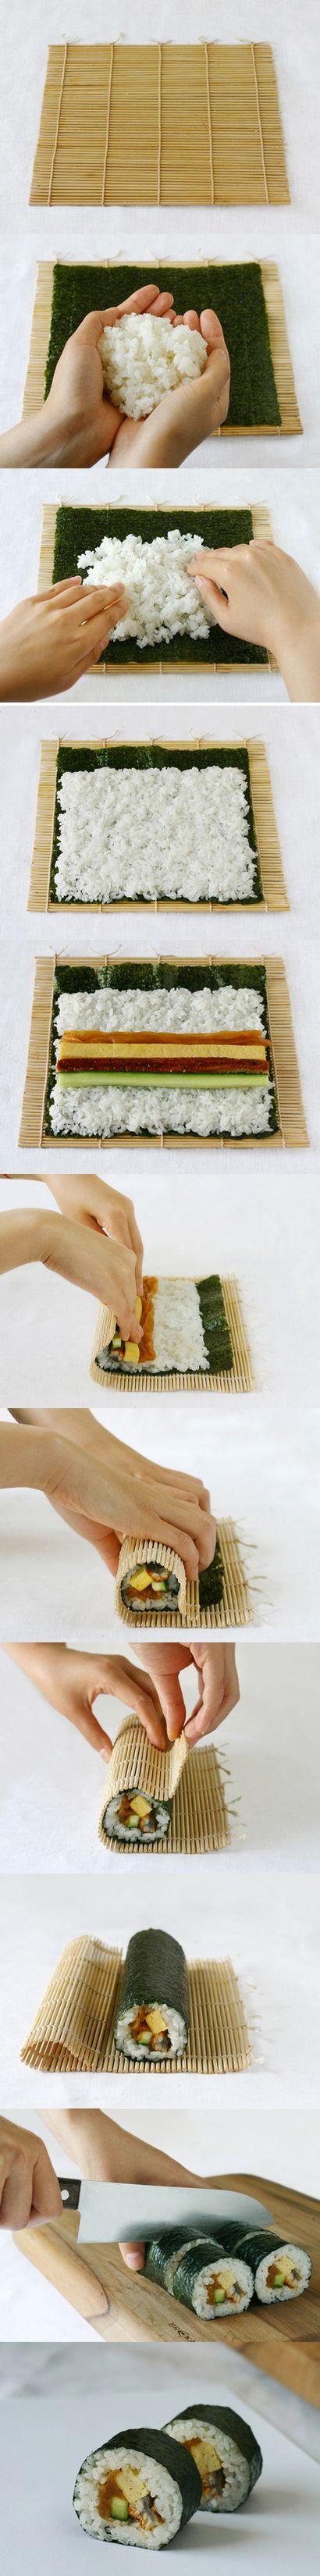 DIY - How to make sushi rolls